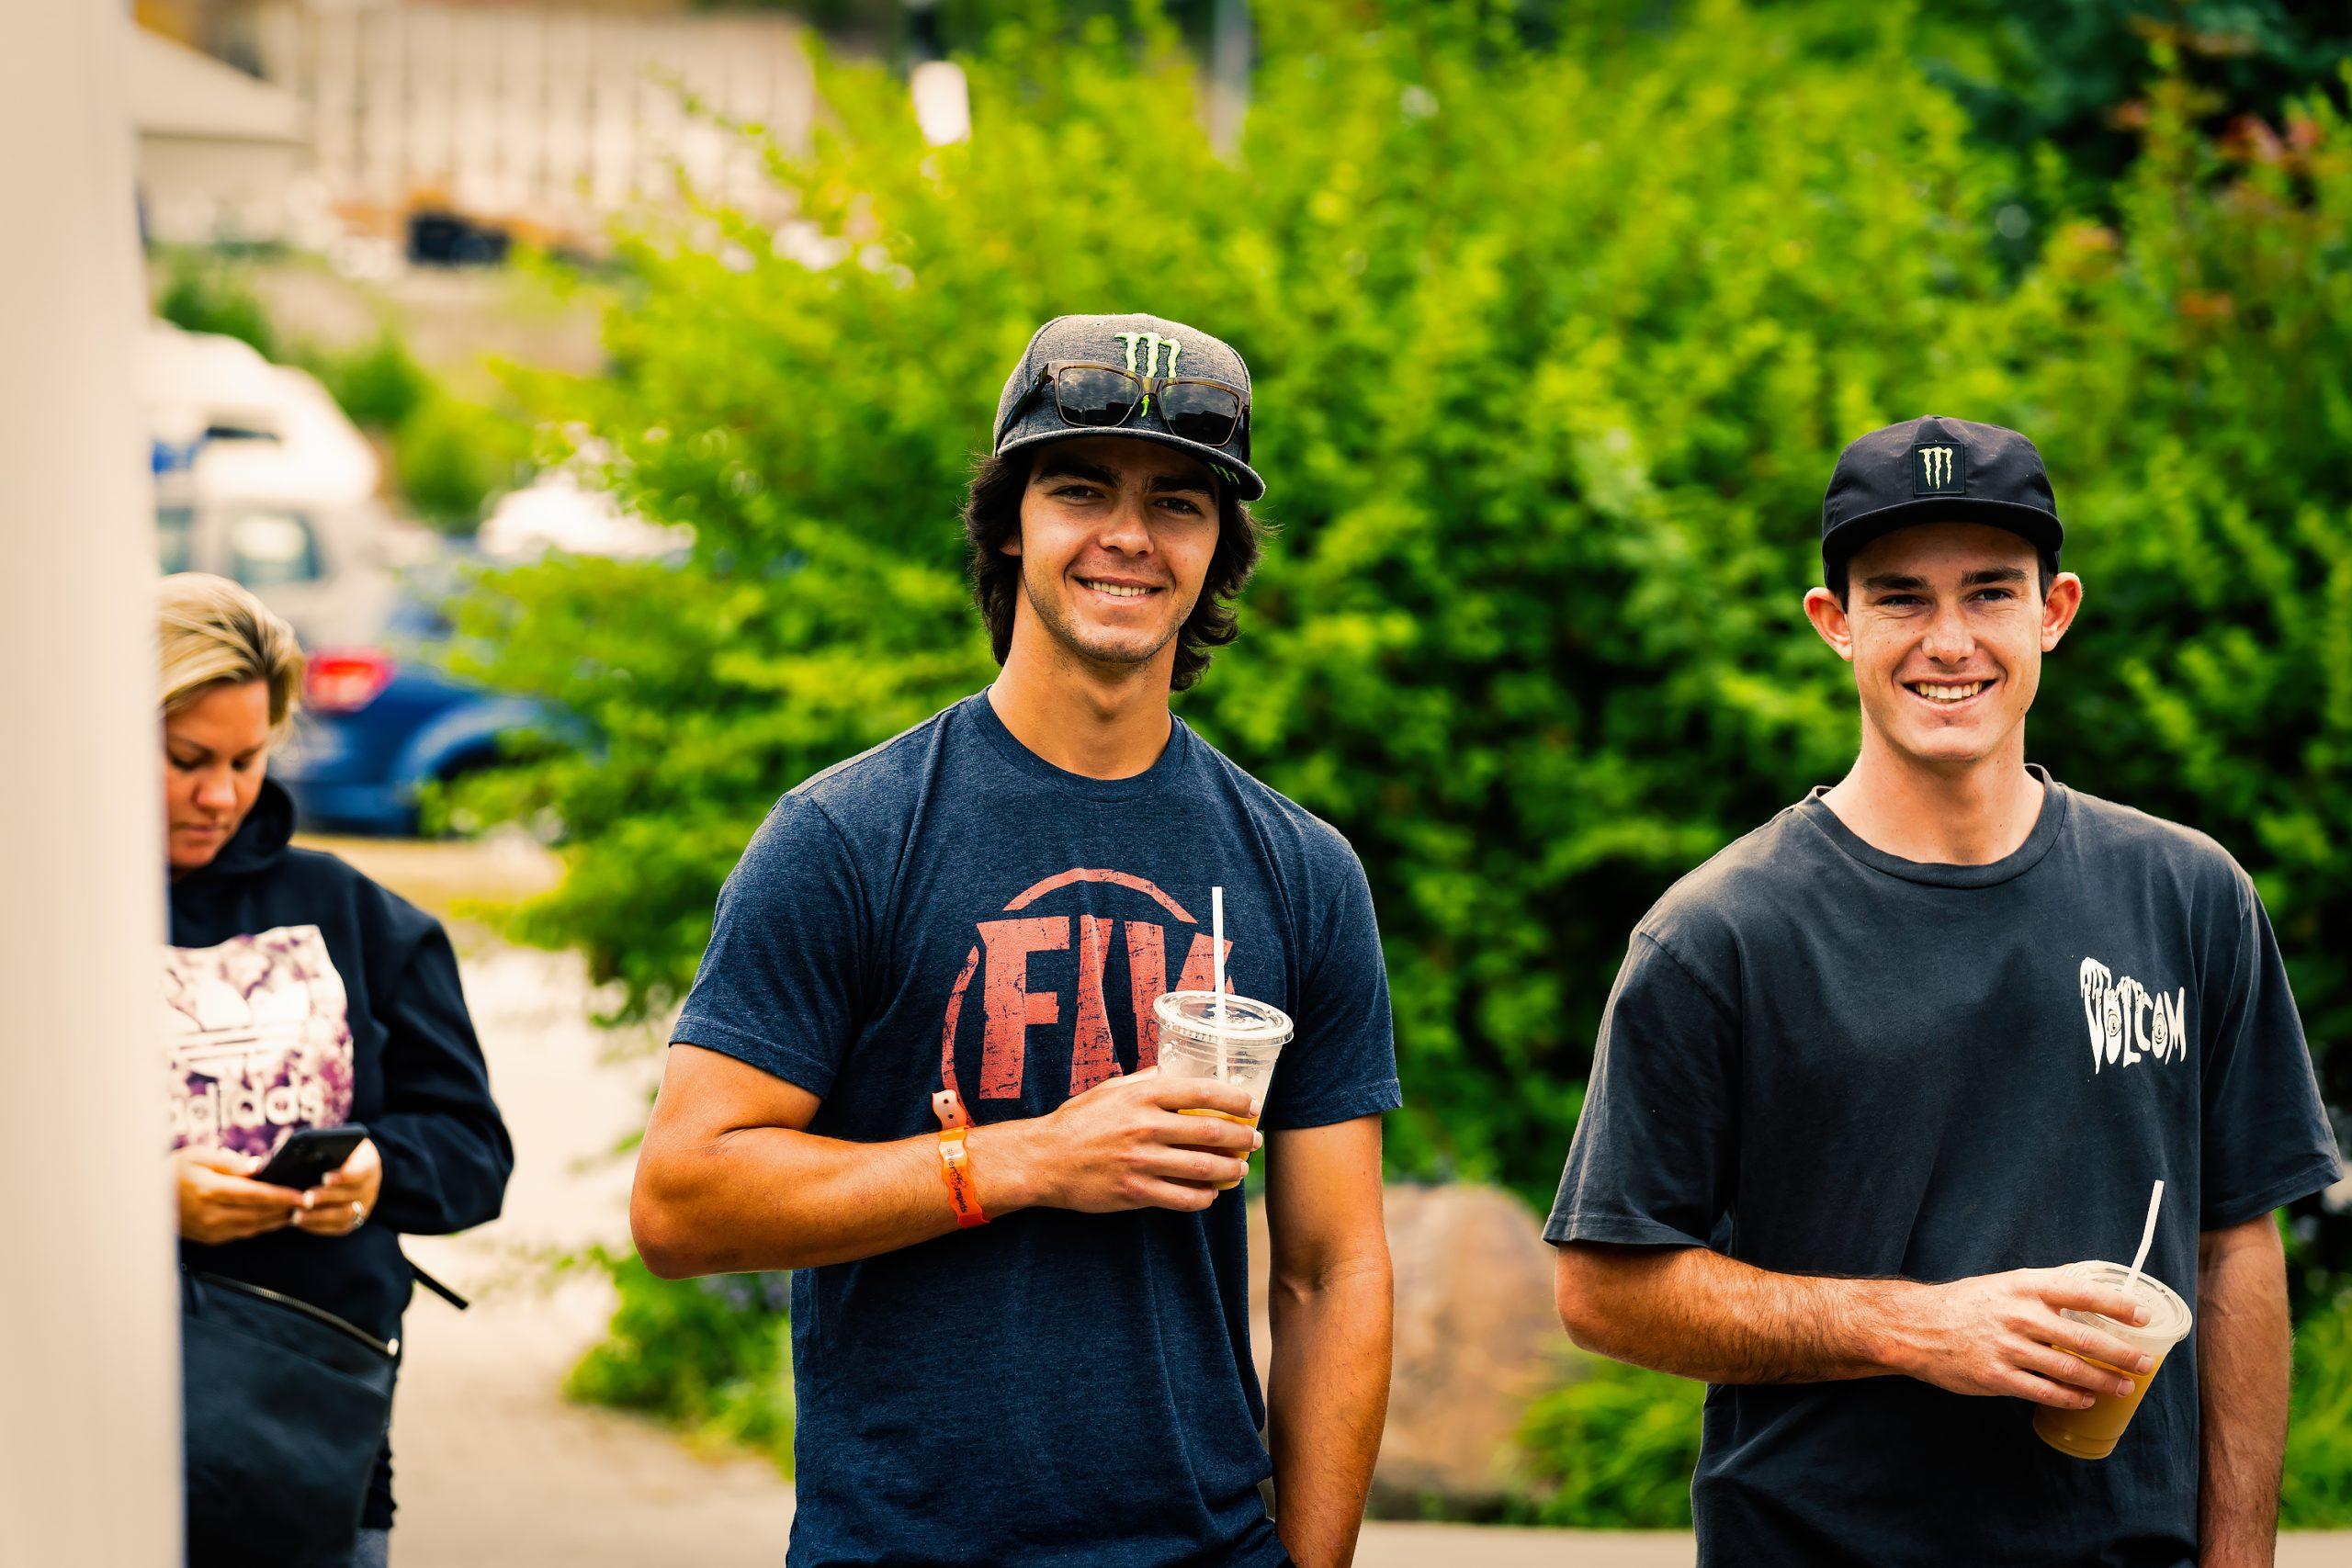 KHS Pro MTB: Steven Walton and Nik Nestoroff